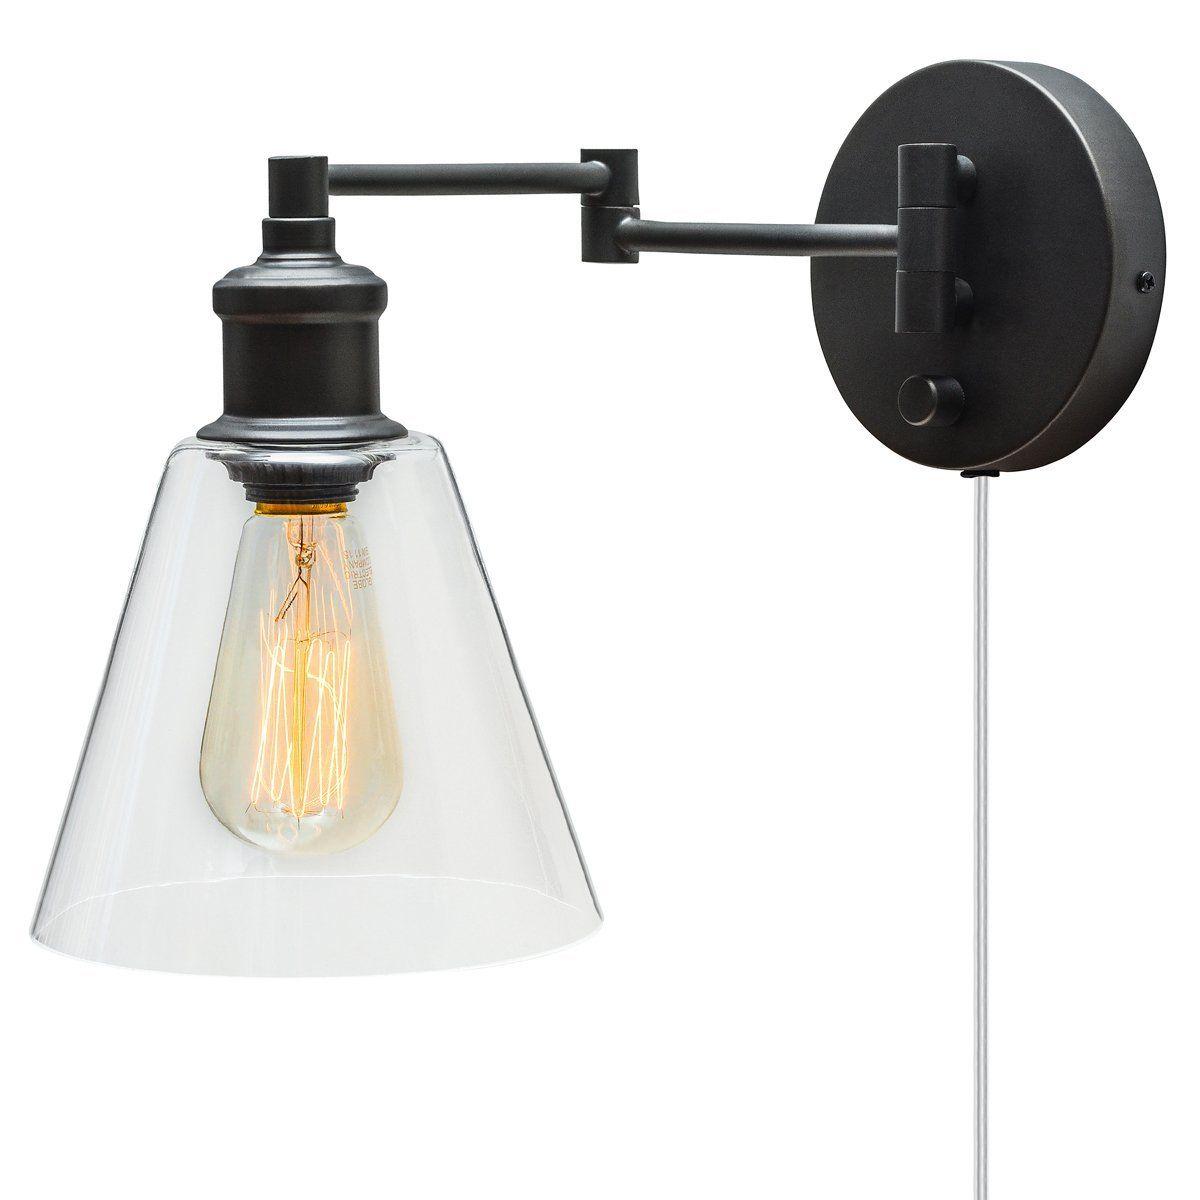 Amazon.com: Globe Electric LeClair 1-Light Plug-In or Hardwire ...